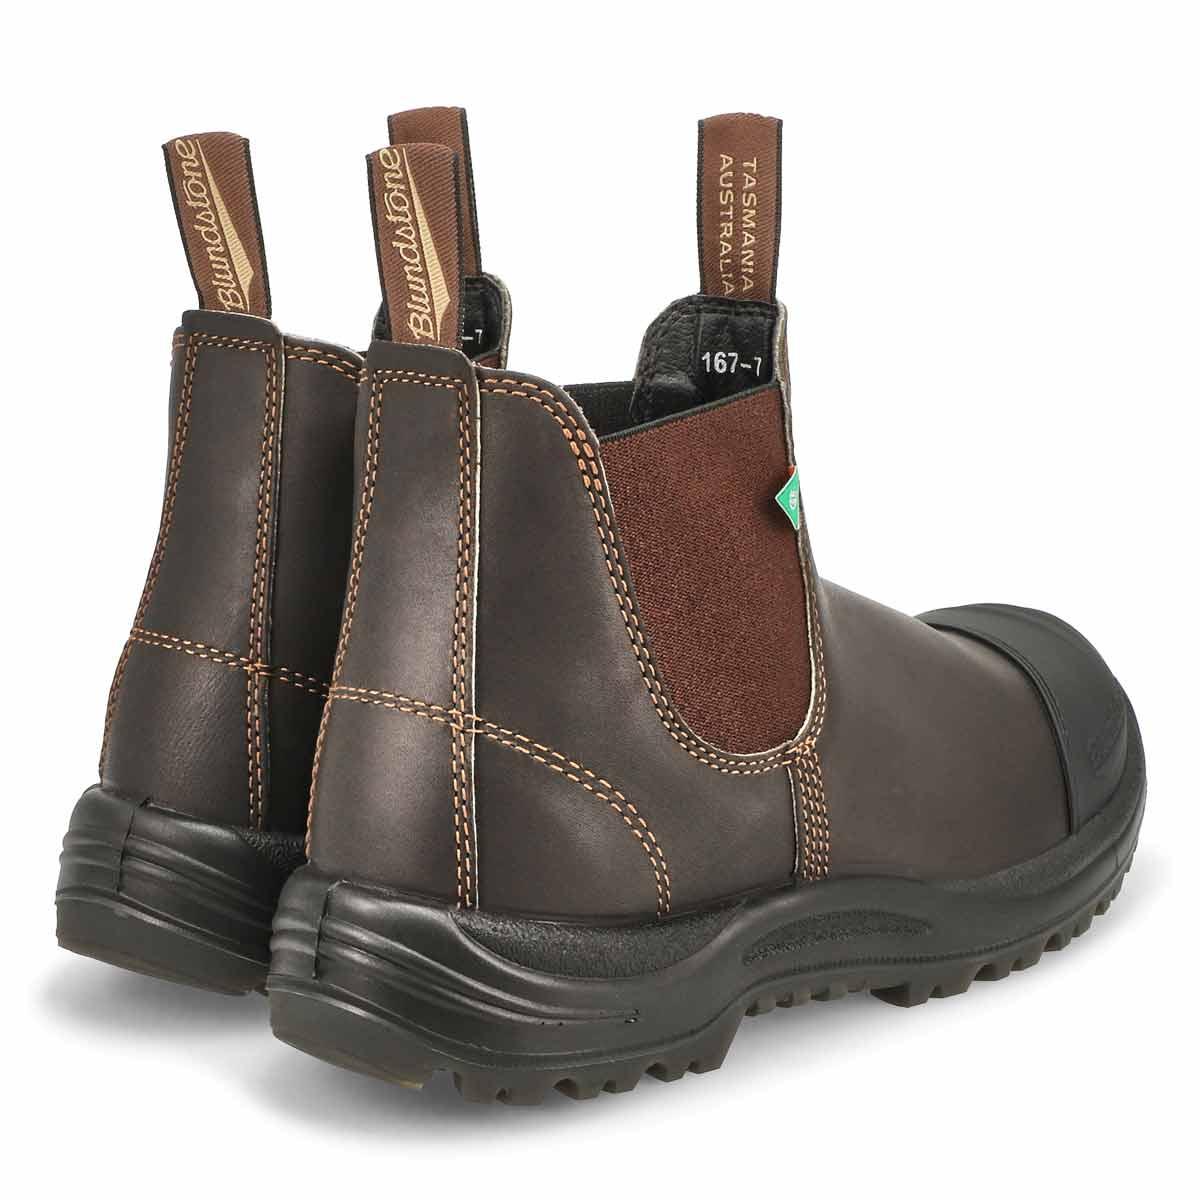 Unisex CSA stout brn twin gore boot